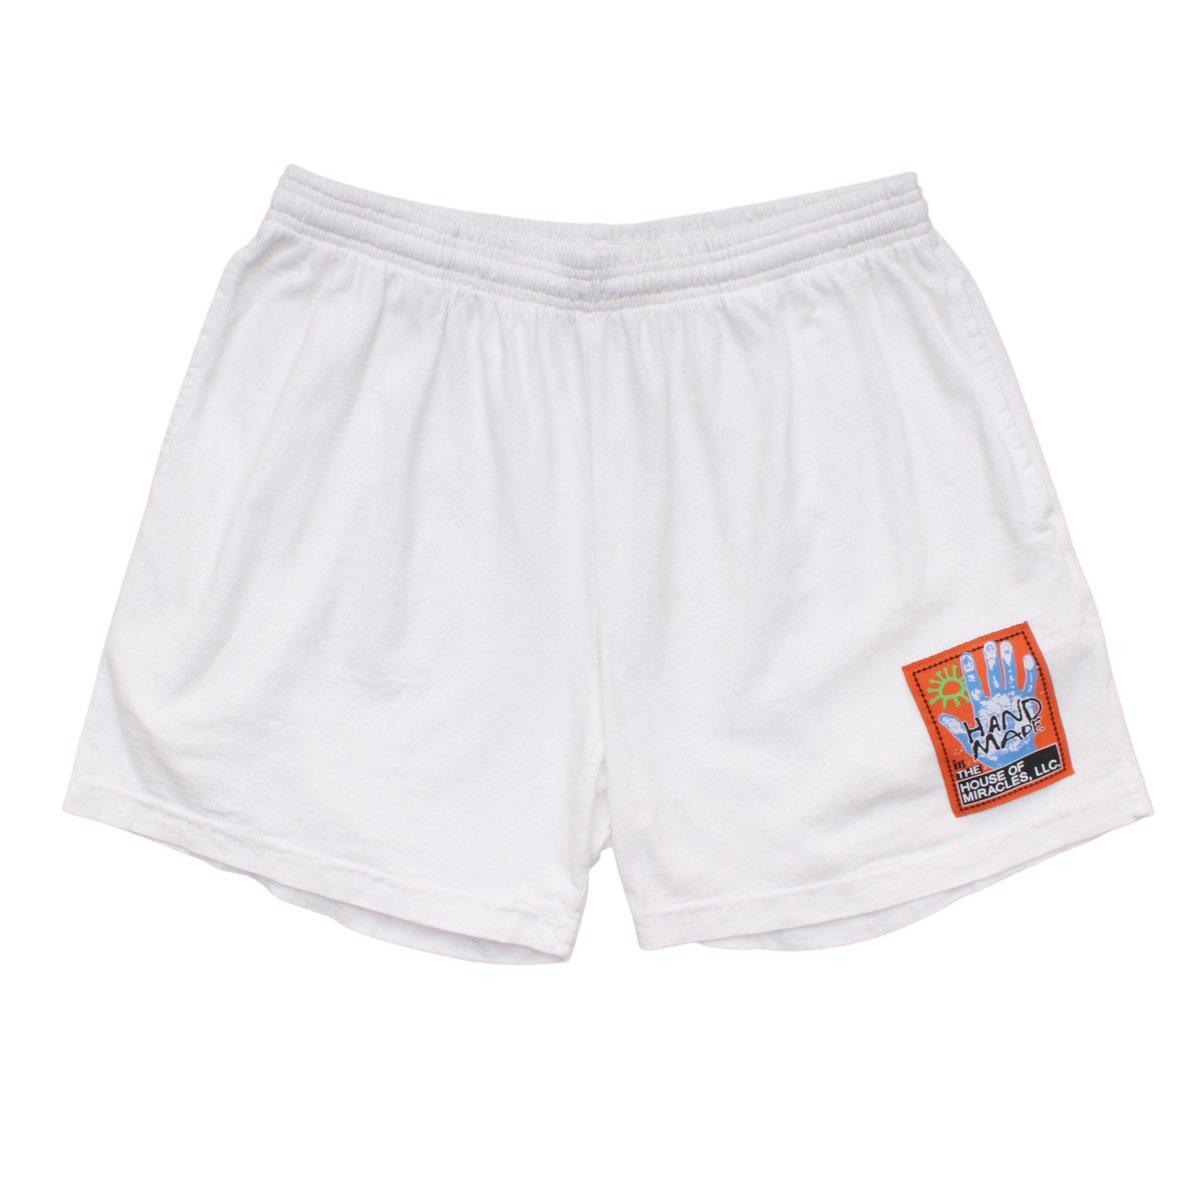 The Studio Shorts